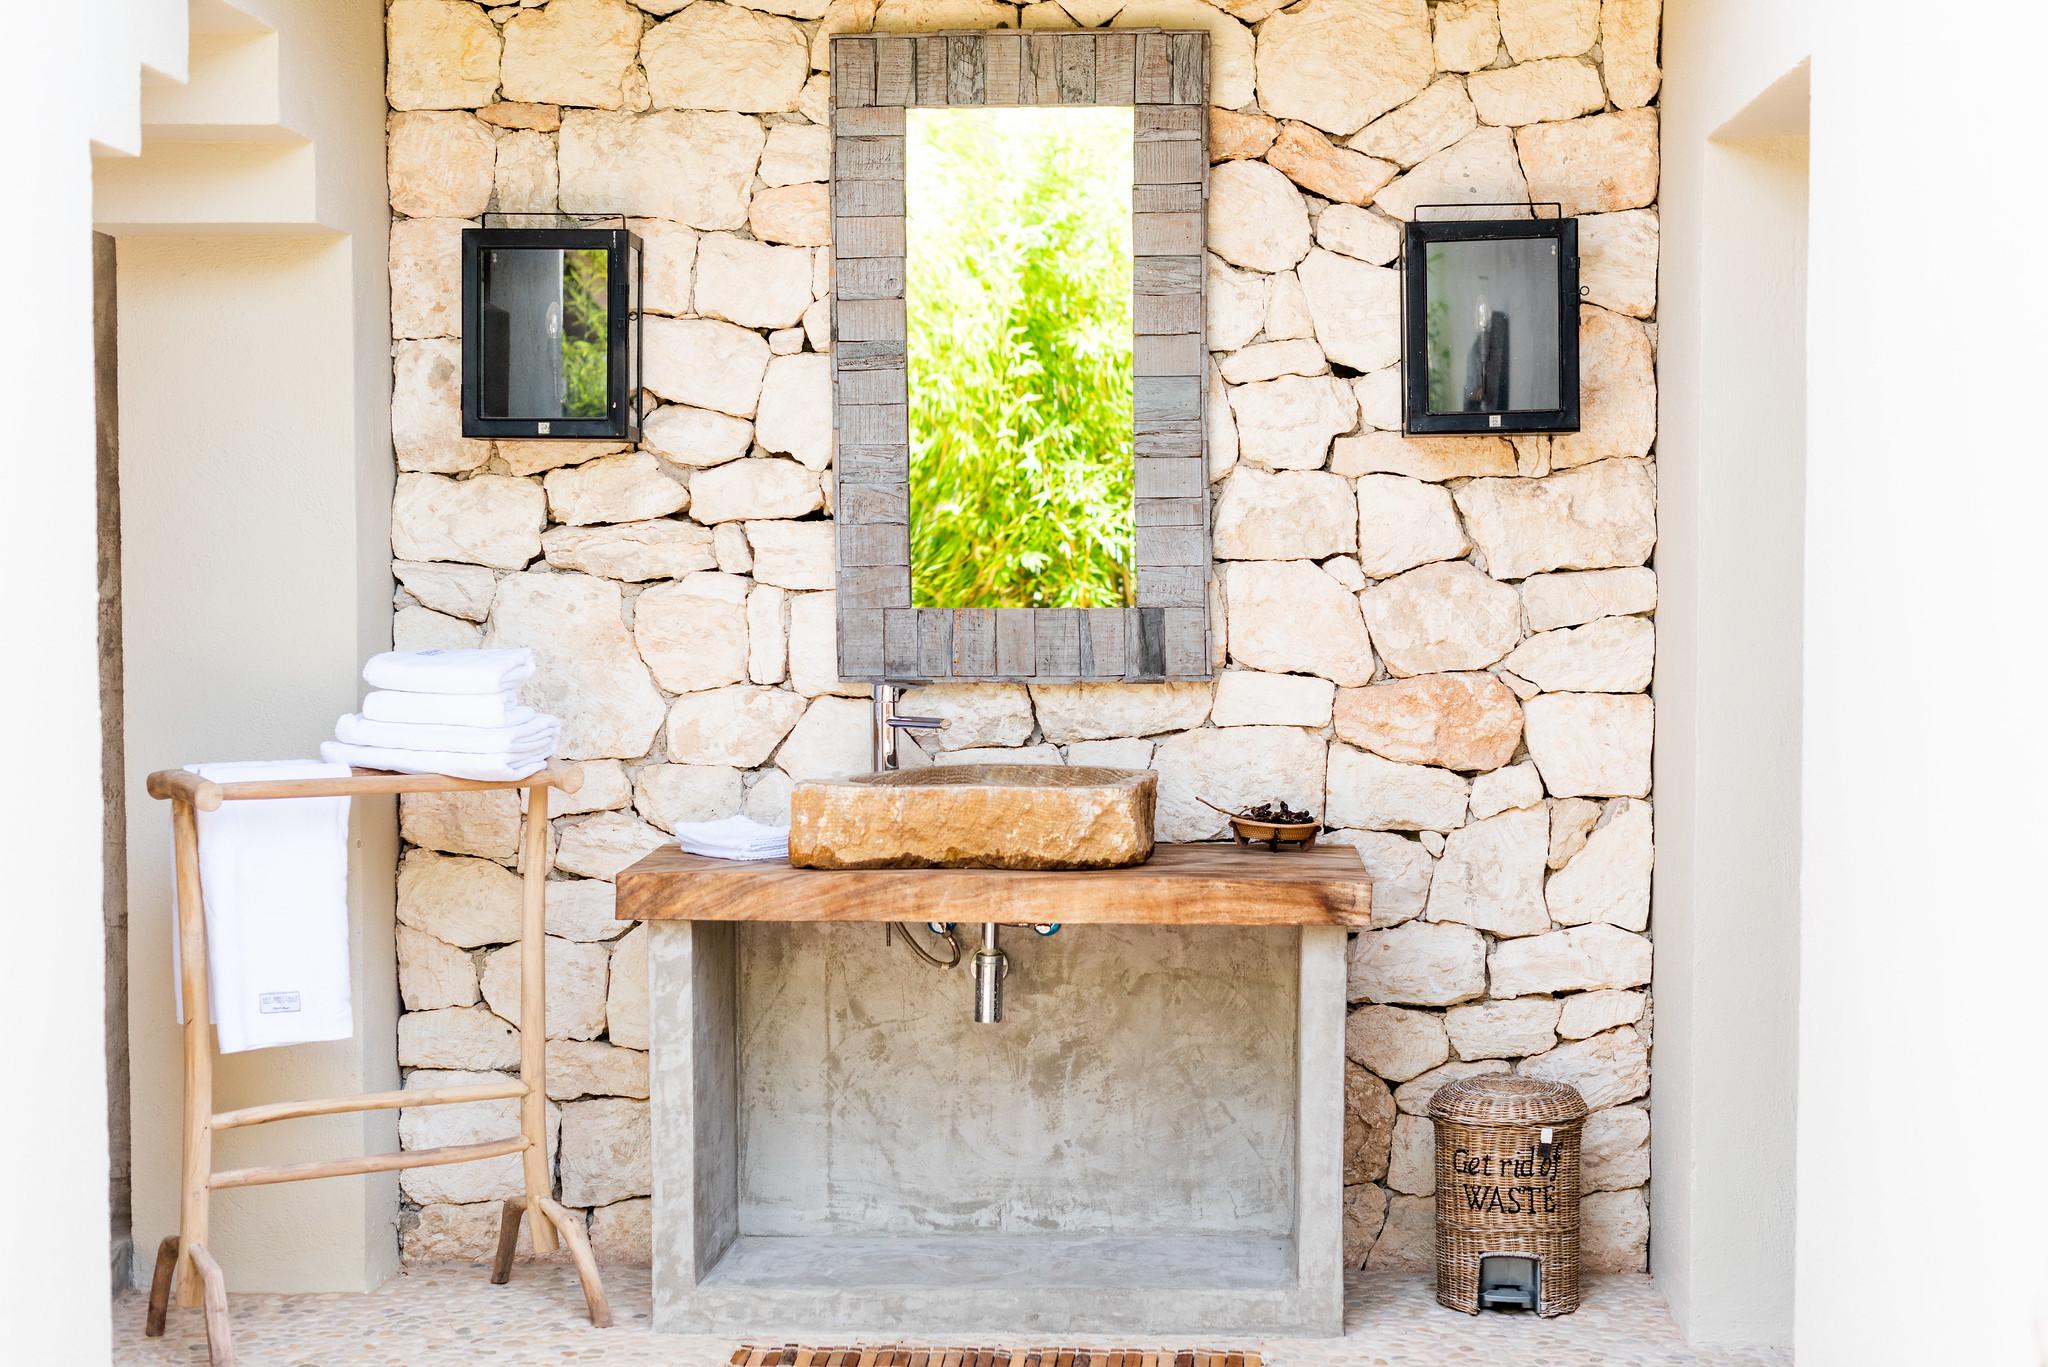 https://www.white-ibiza.com/wp-content/uploads/2020/05/white-ibiza-villas-can-riviere-exterior-outside-bathroom.jpg